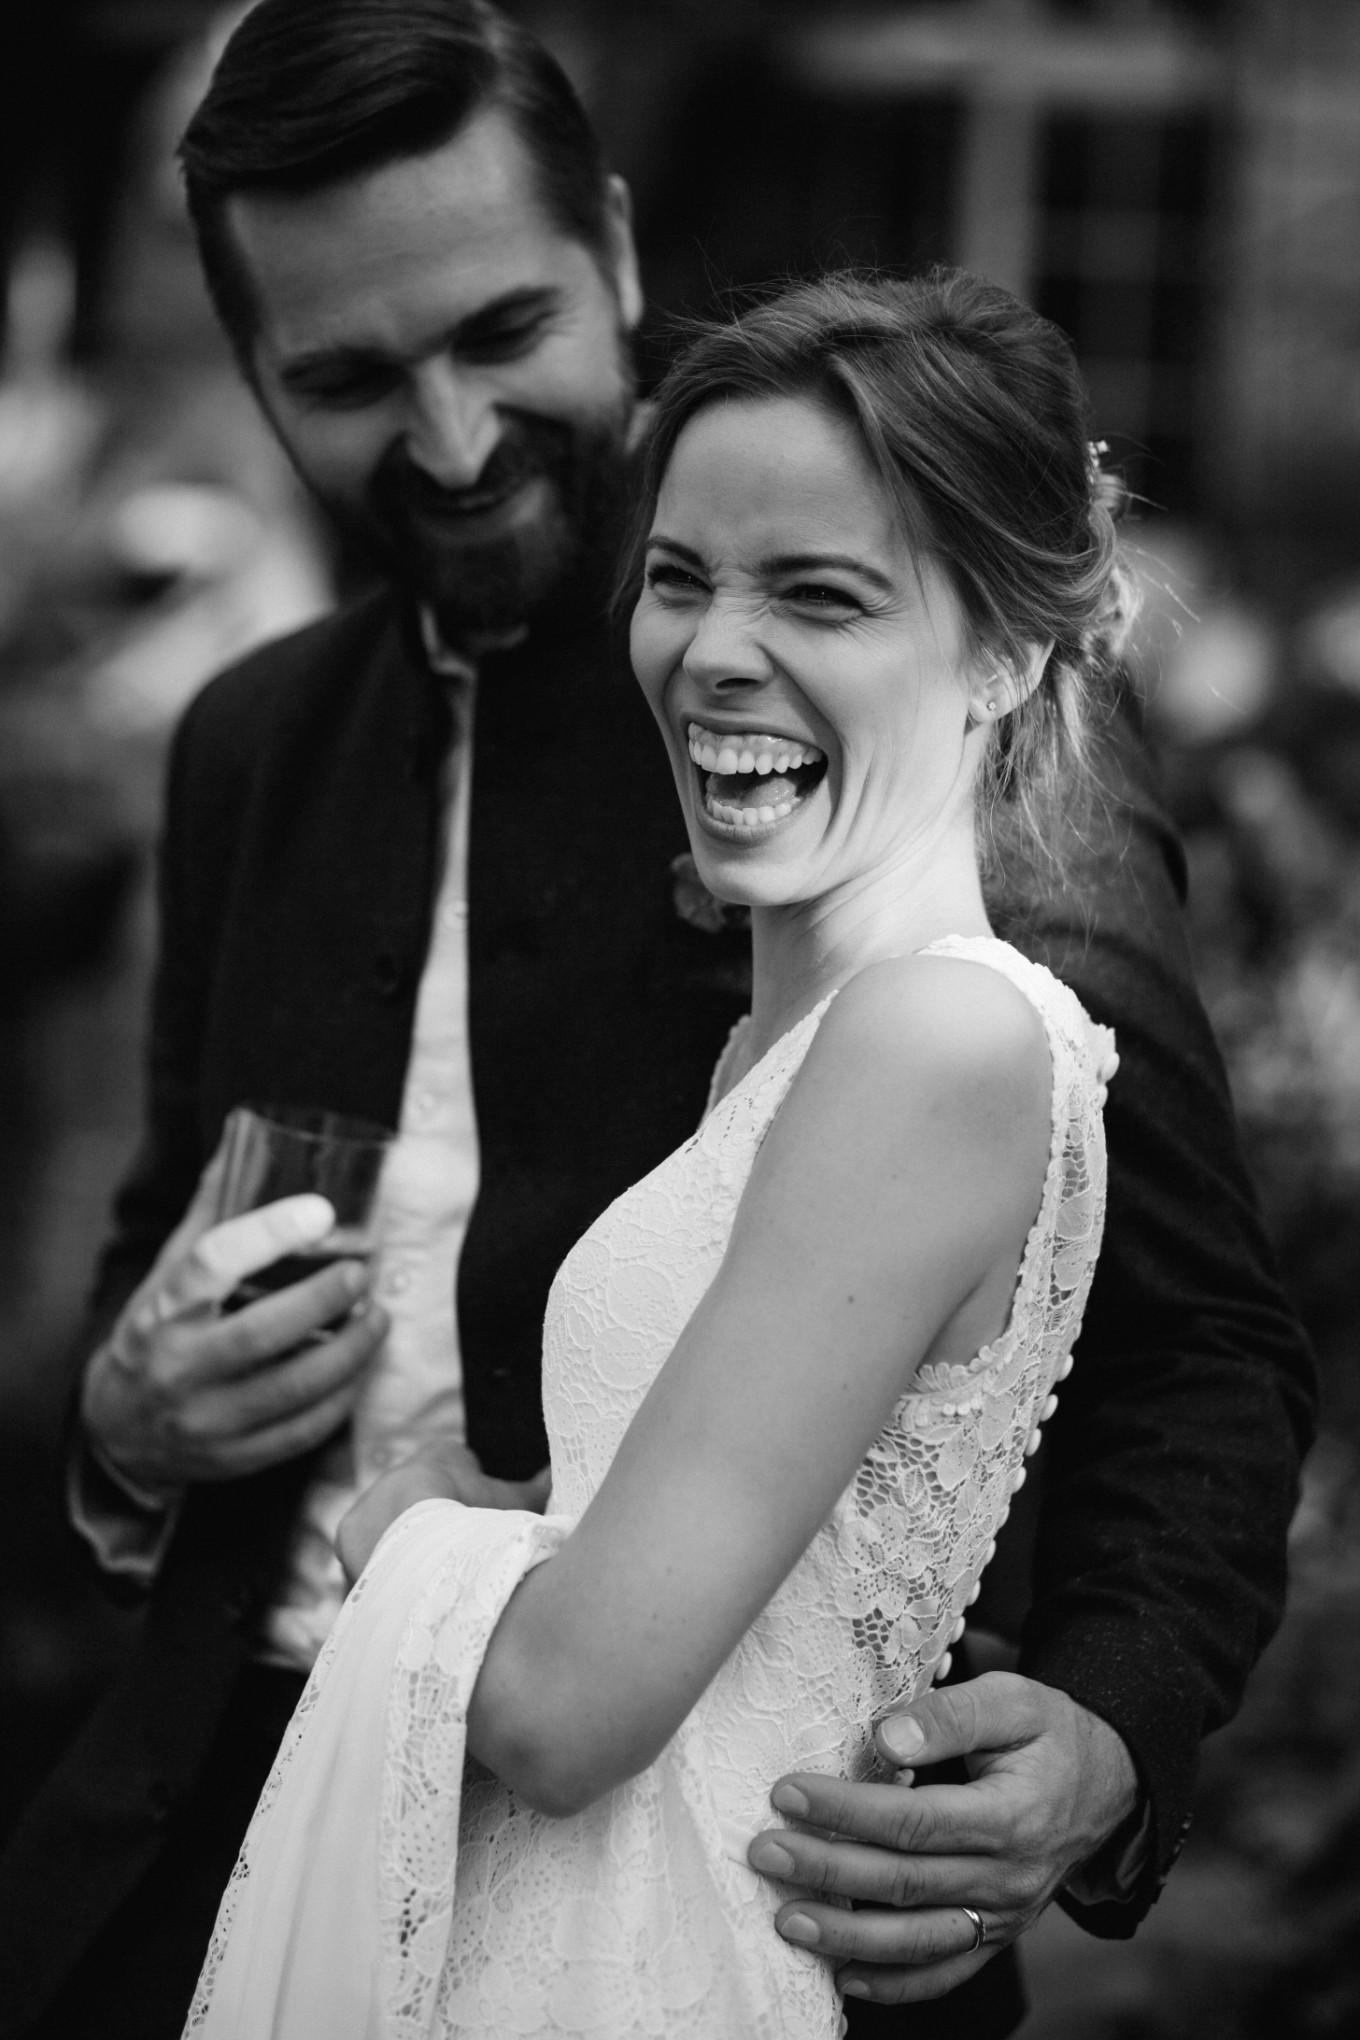 Berlin-Wannsee-Pia-Anna-Christian-Wedding-Photography-ST-60.jpg